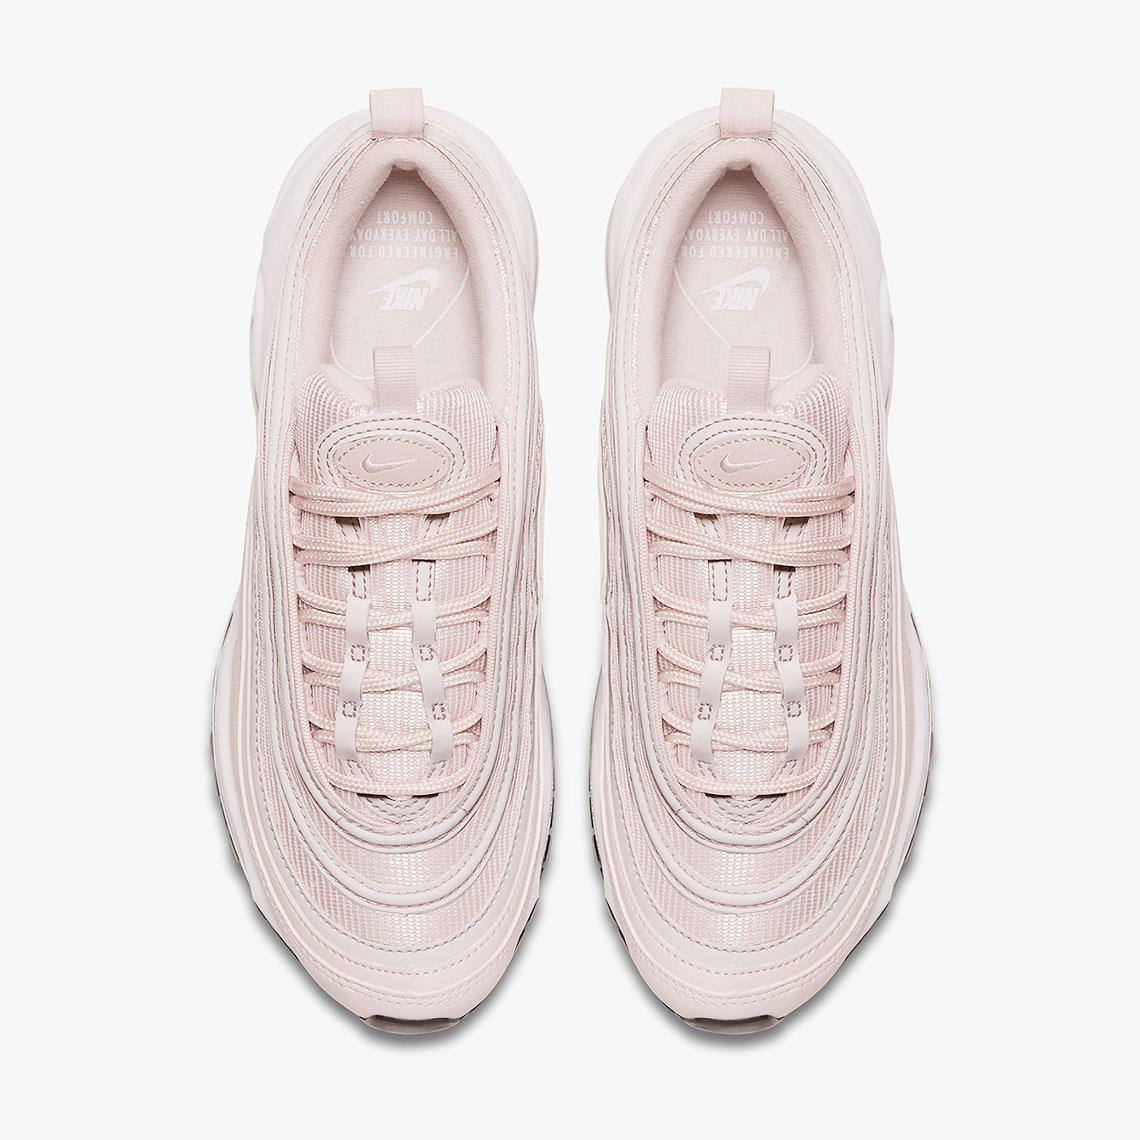 Marvel Light Shoes